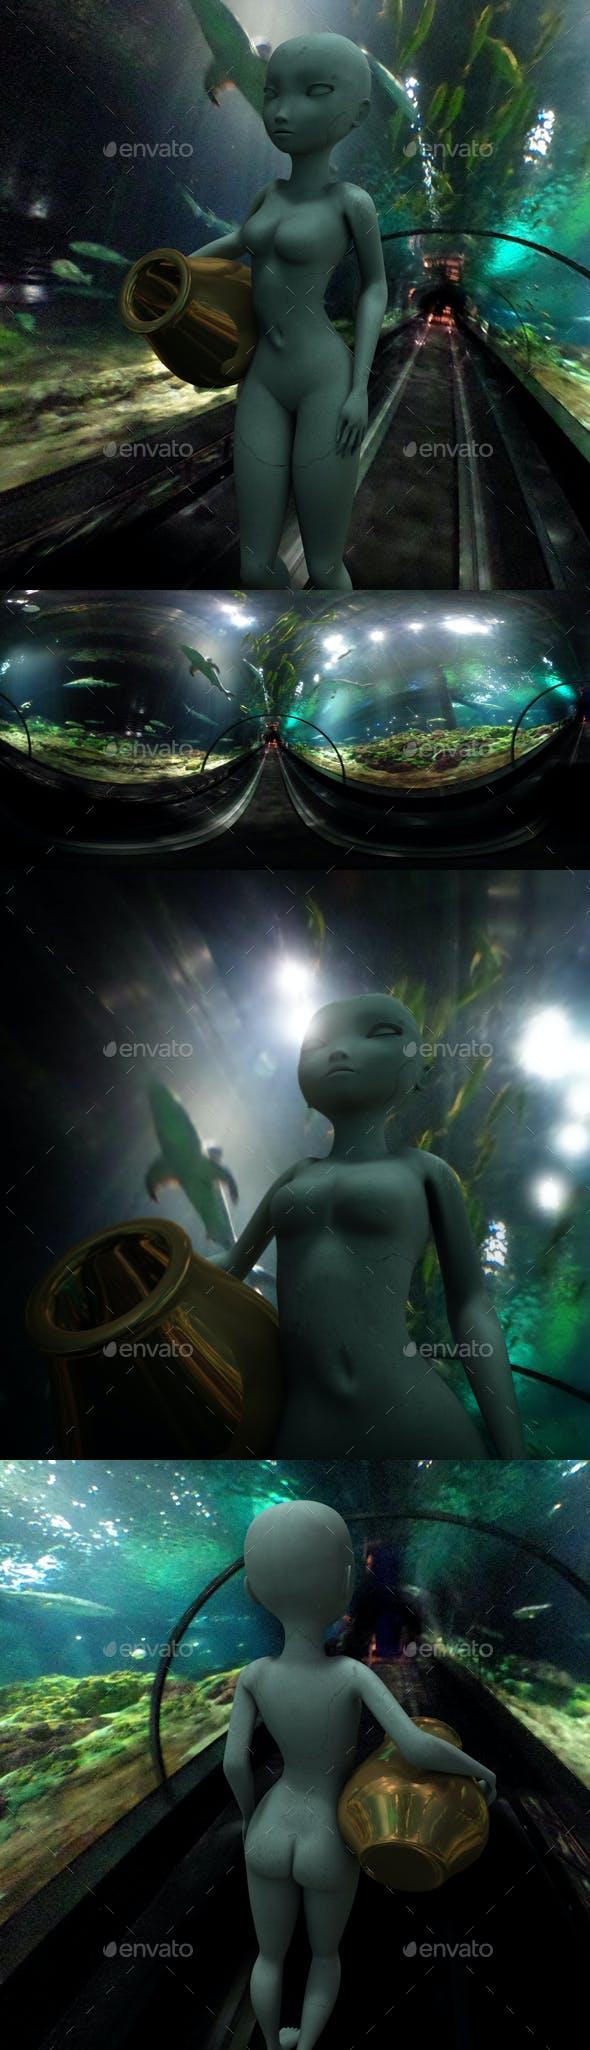 Underwater Tunnel HDRI - 3DOcean Item for Sale